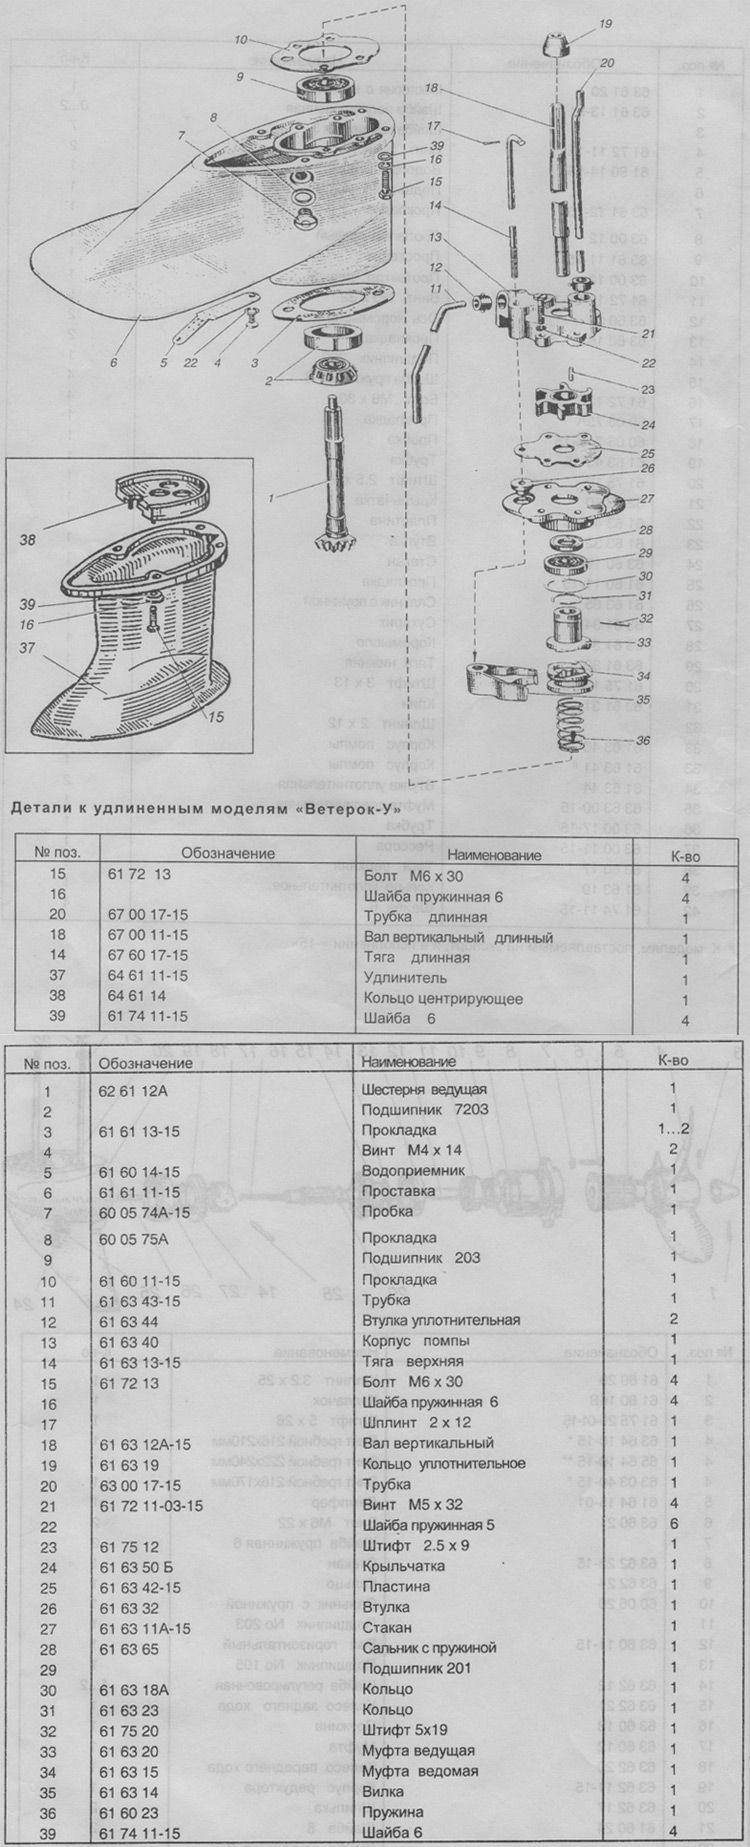 http://www.moto-market.ru/fotografii-zapchastej/veterok/reduktor-lodochnyh-motorov-veterok-8-i-veterok-12.jpg